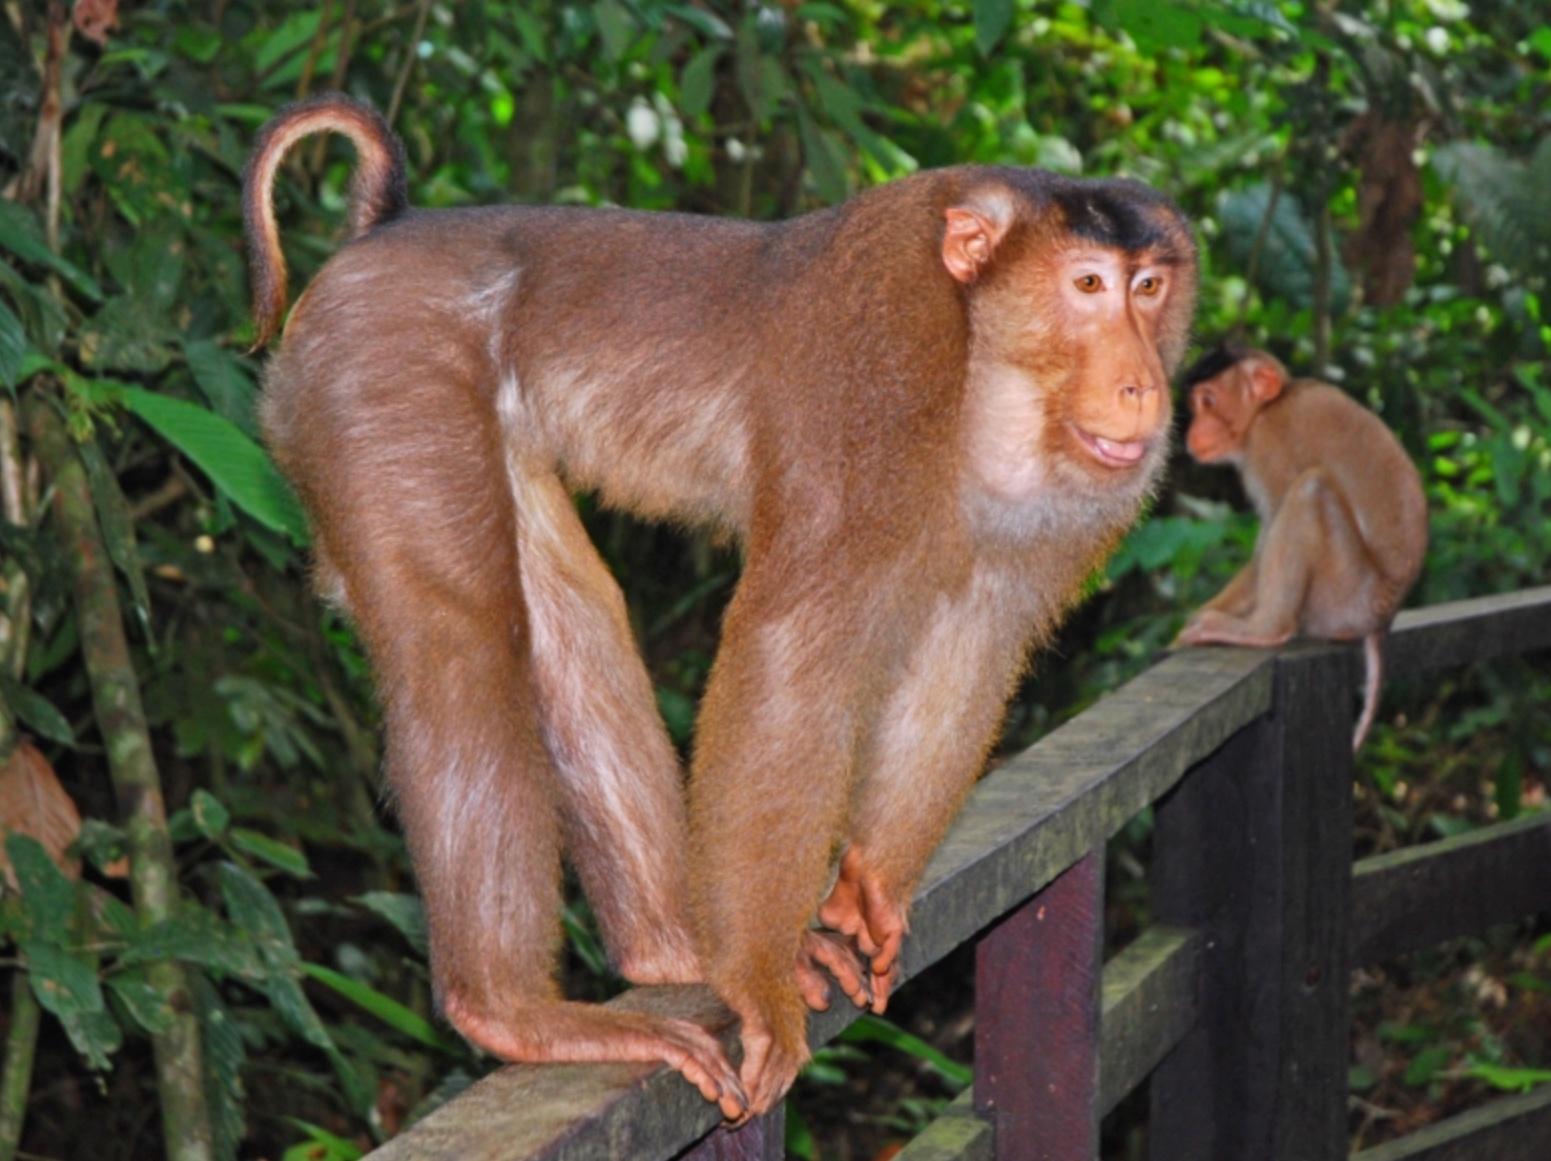 boingboing.net - David Pescovitz - Thousands of monkeys still in forced labor farms